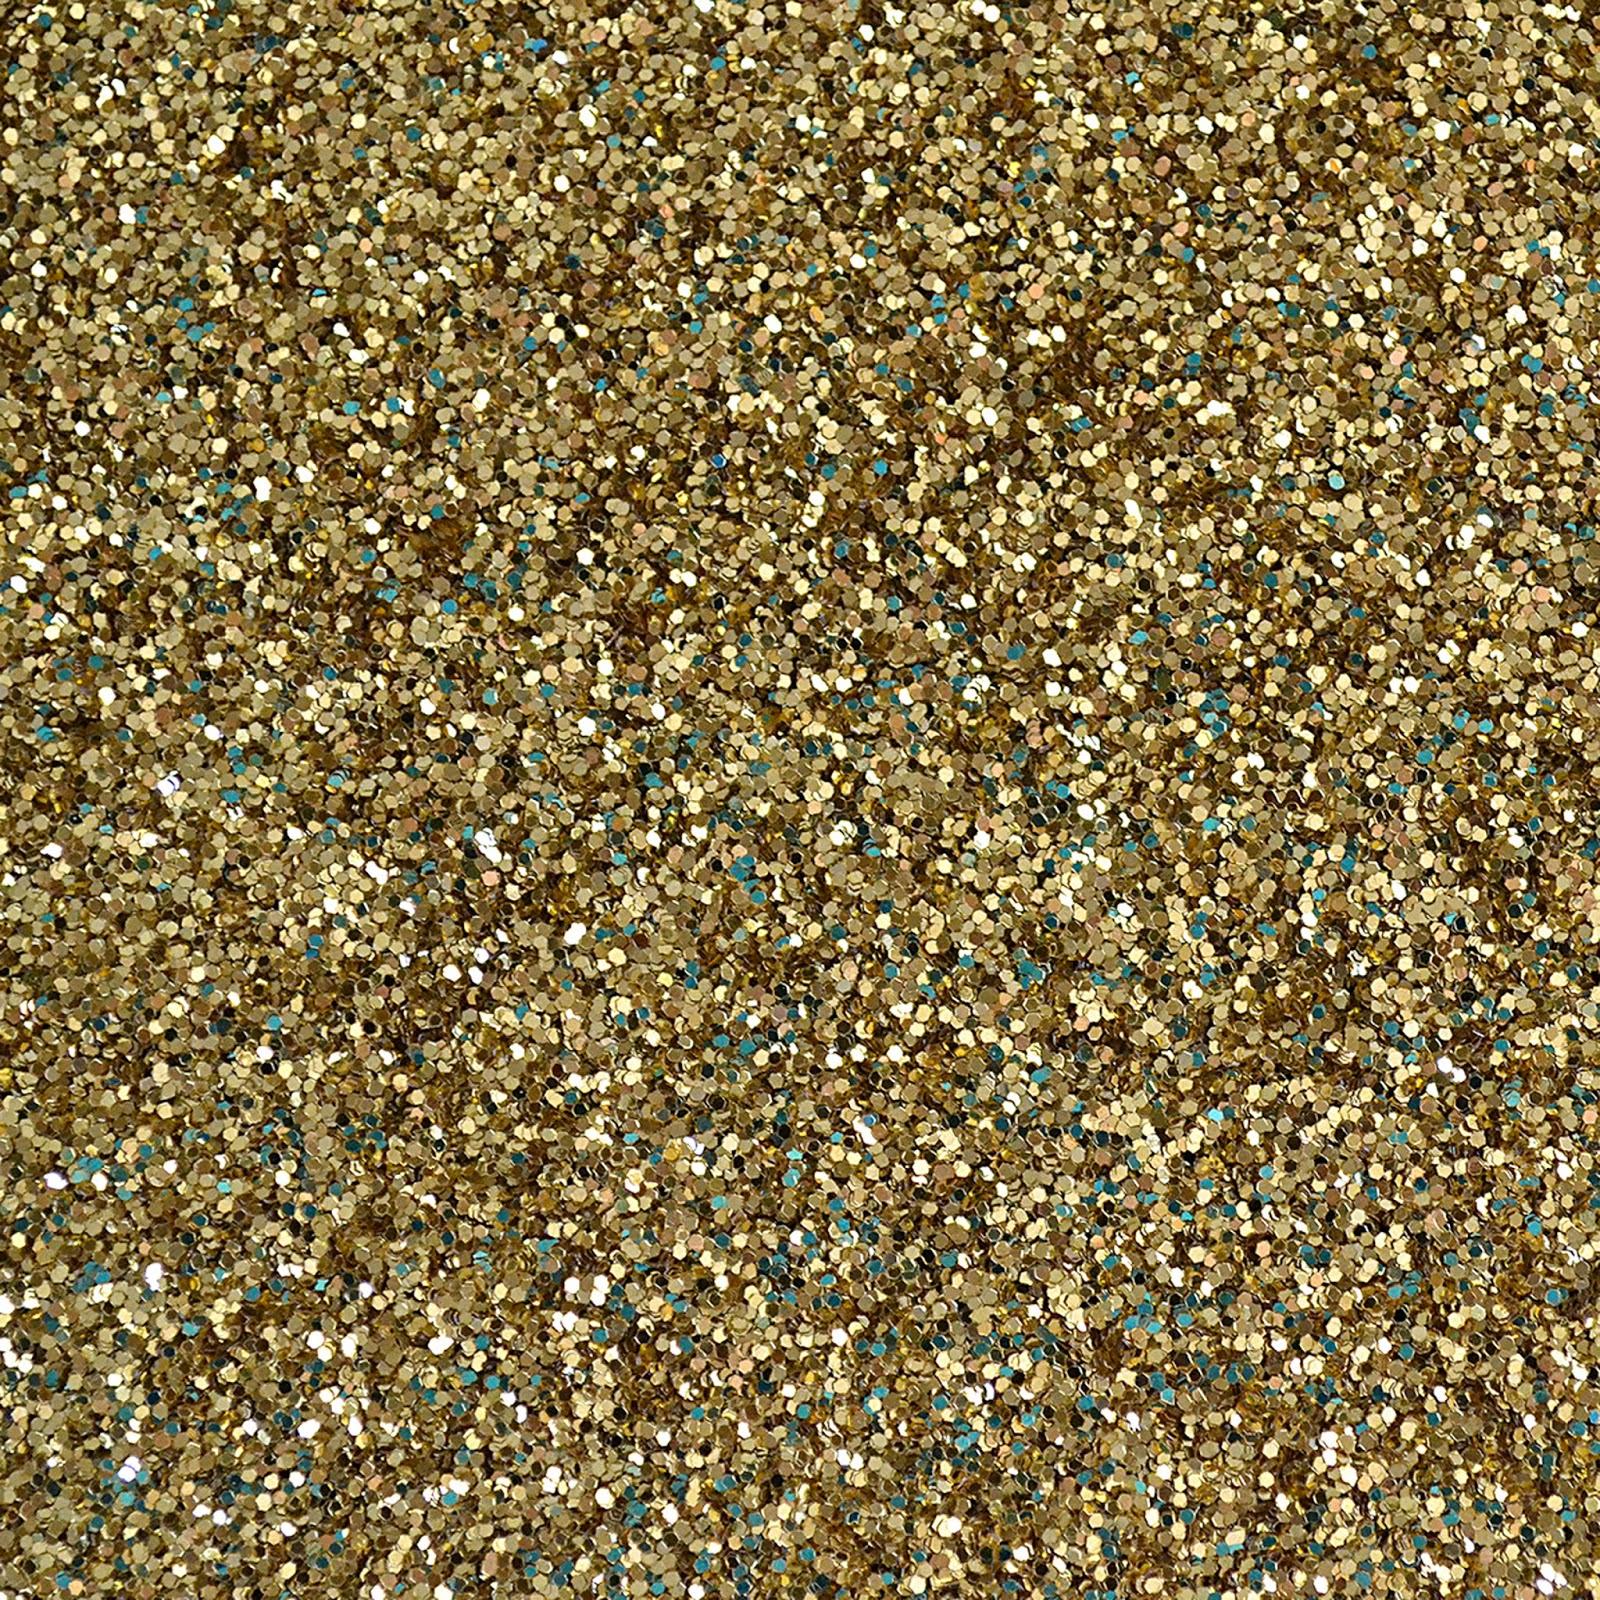 http://2.bp.blogspot.com/-zte9PTLQIRQ/VGF58MRrStI/AAAAAAAAzJs/FlNF0XWlrig/s1600/gold%2Bglitter%2Bbackground.jpg